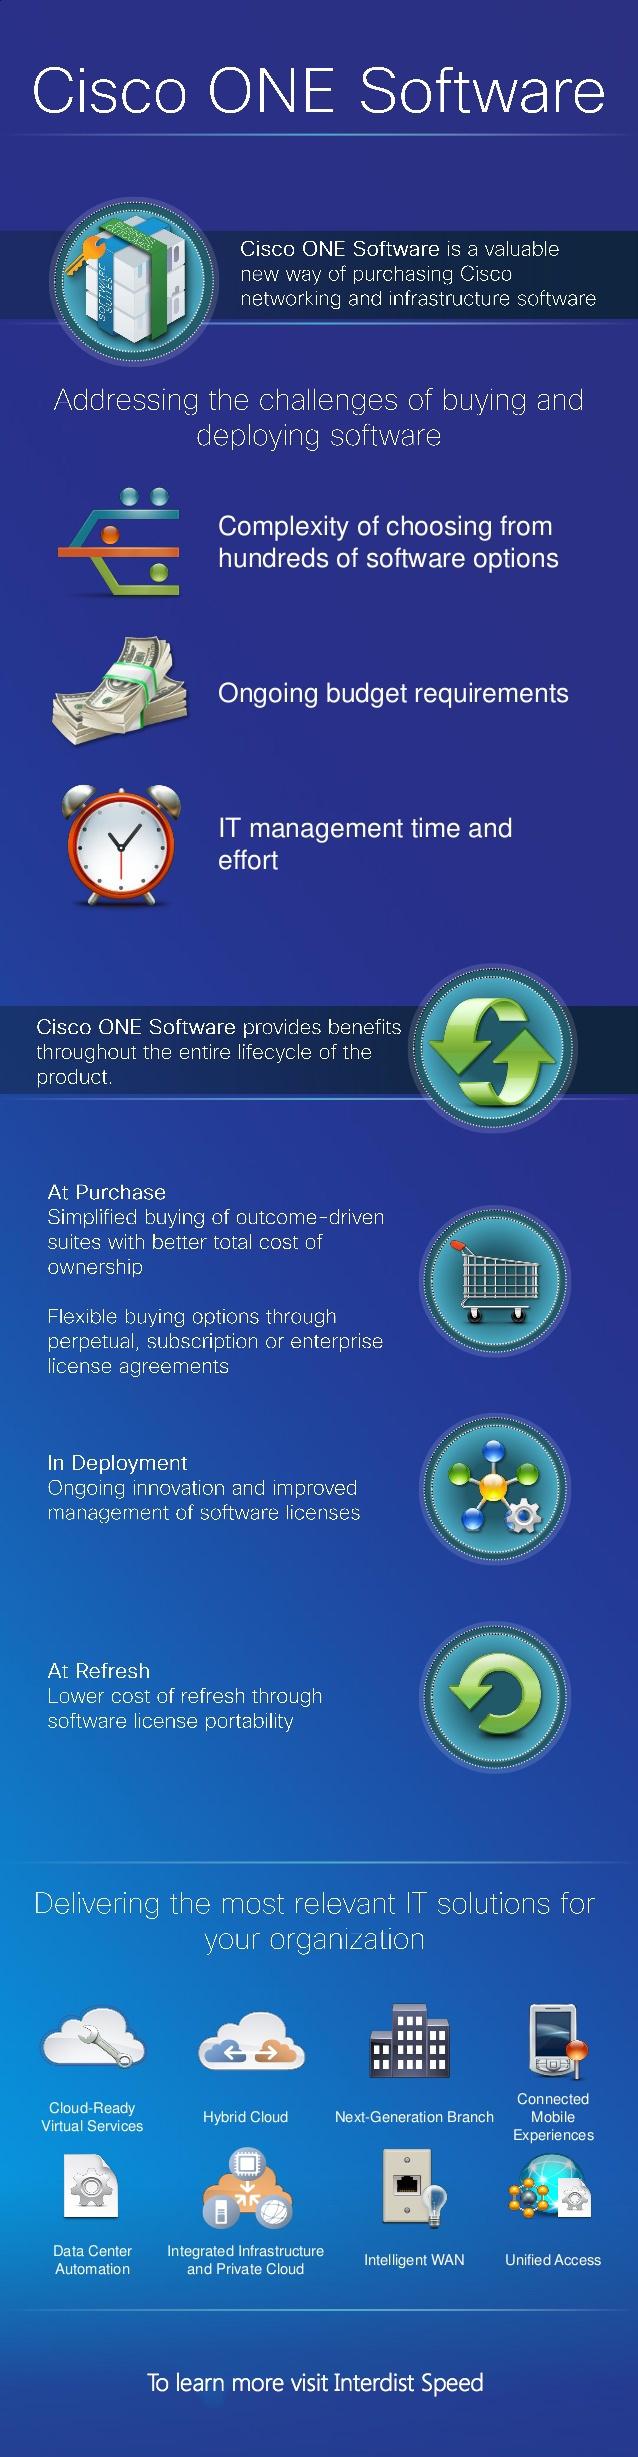 cisco-one-software-infographic.jpg